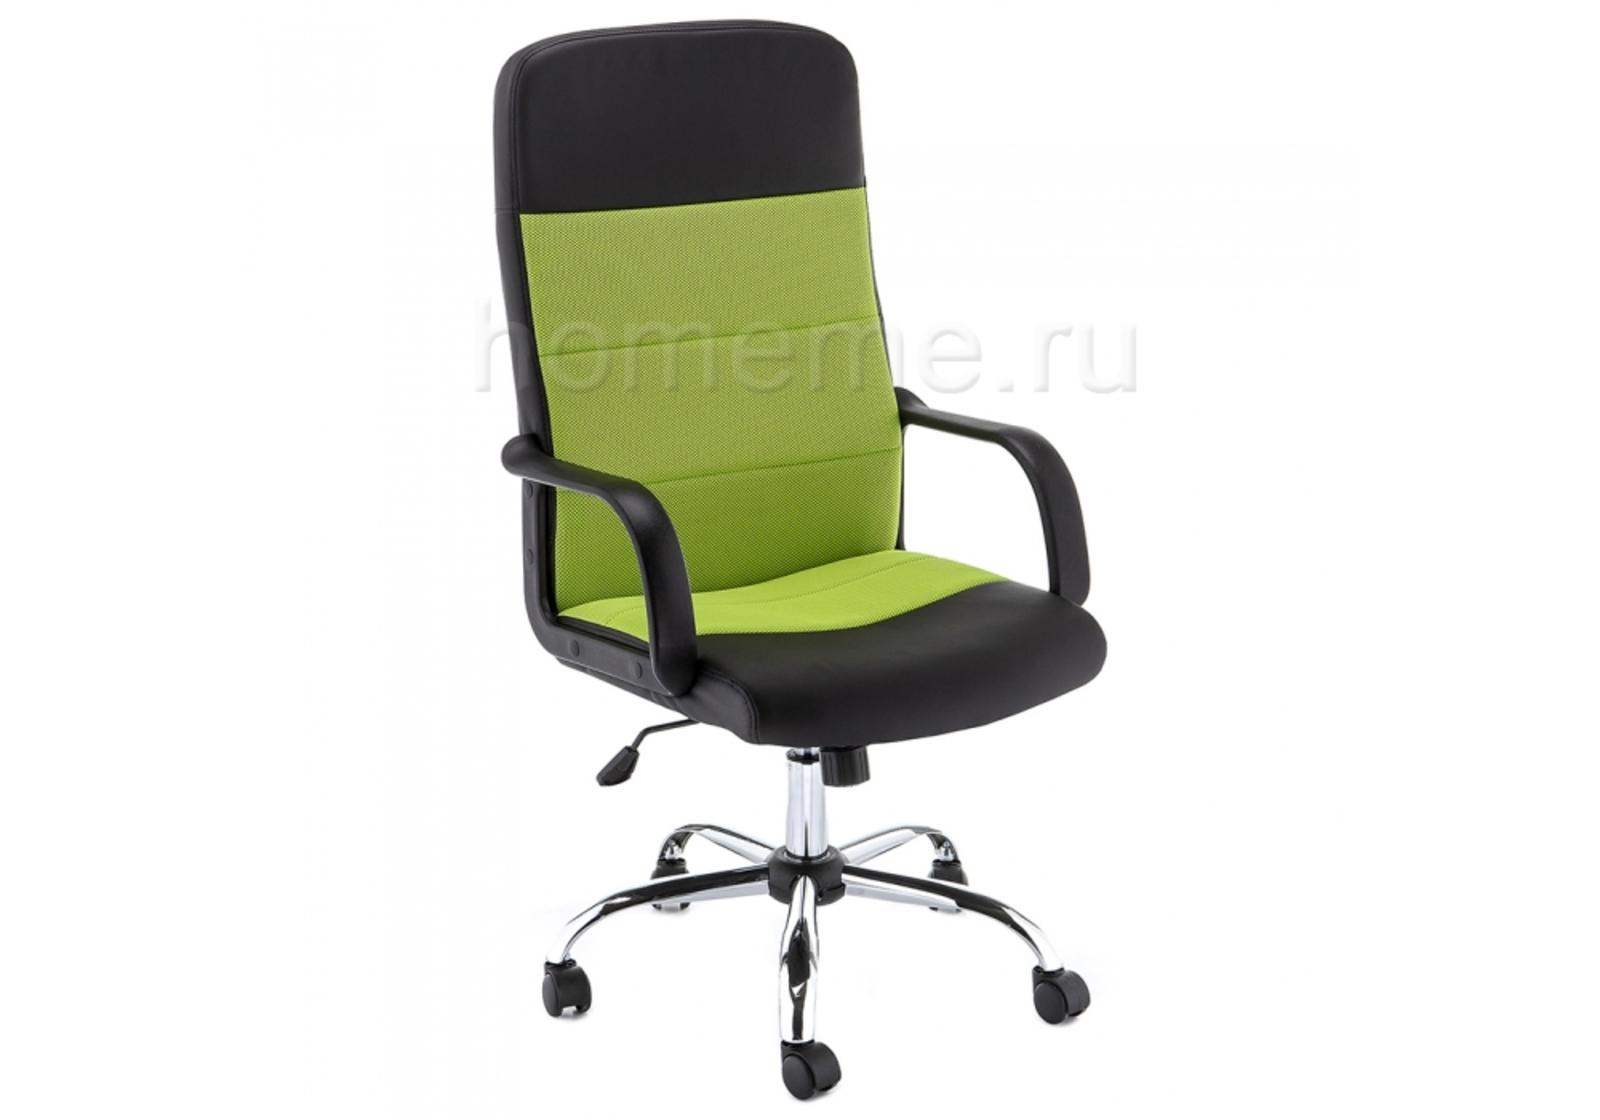 Кресло для офиса HomeMe Prosto черное / зеленое 11284 от Homeme.ru